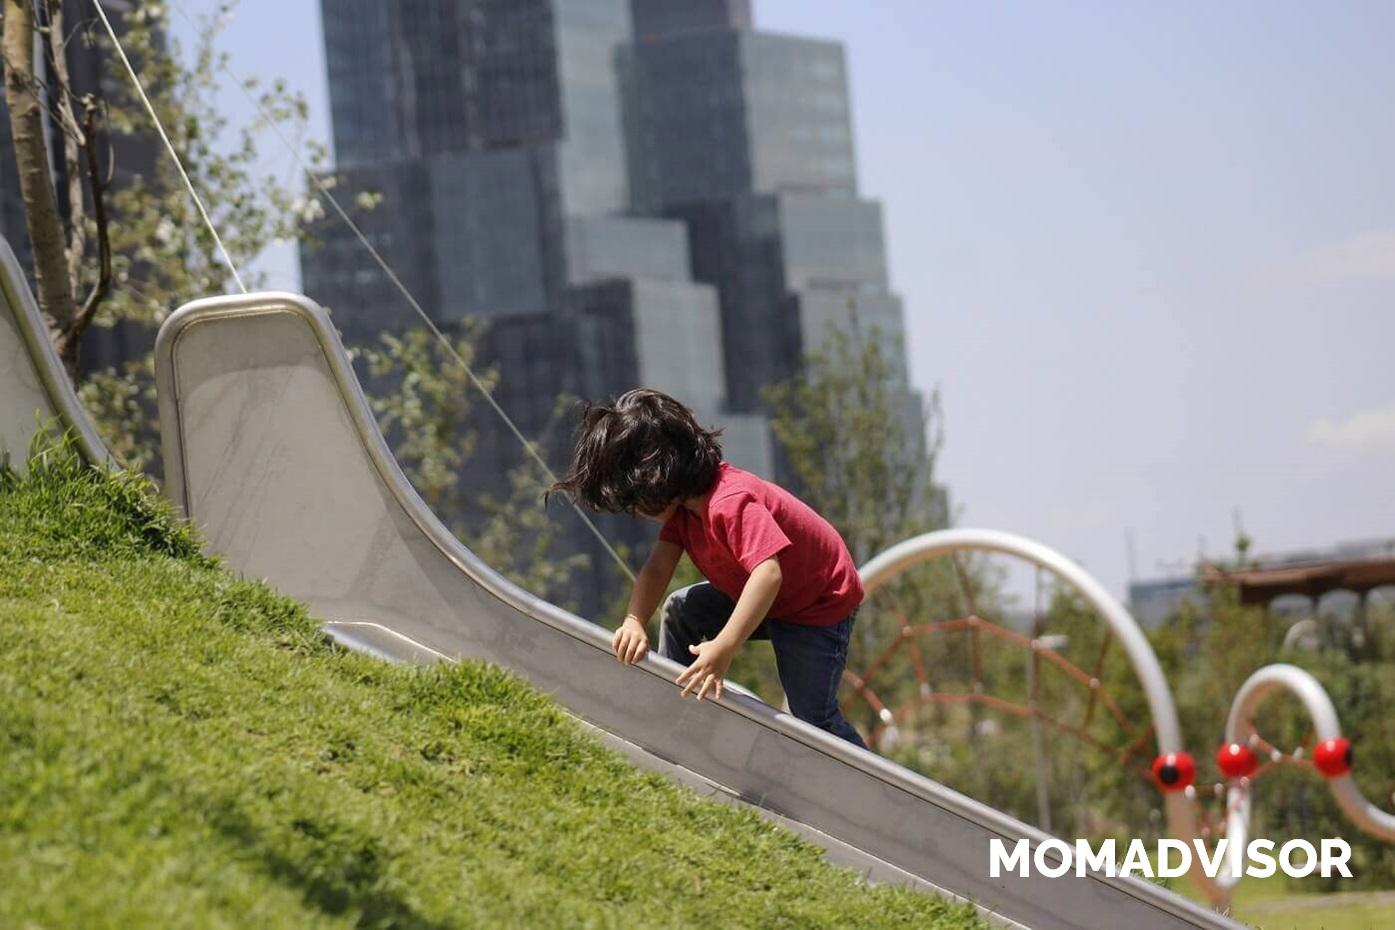 Parque La Mexicana – MomAdvisor